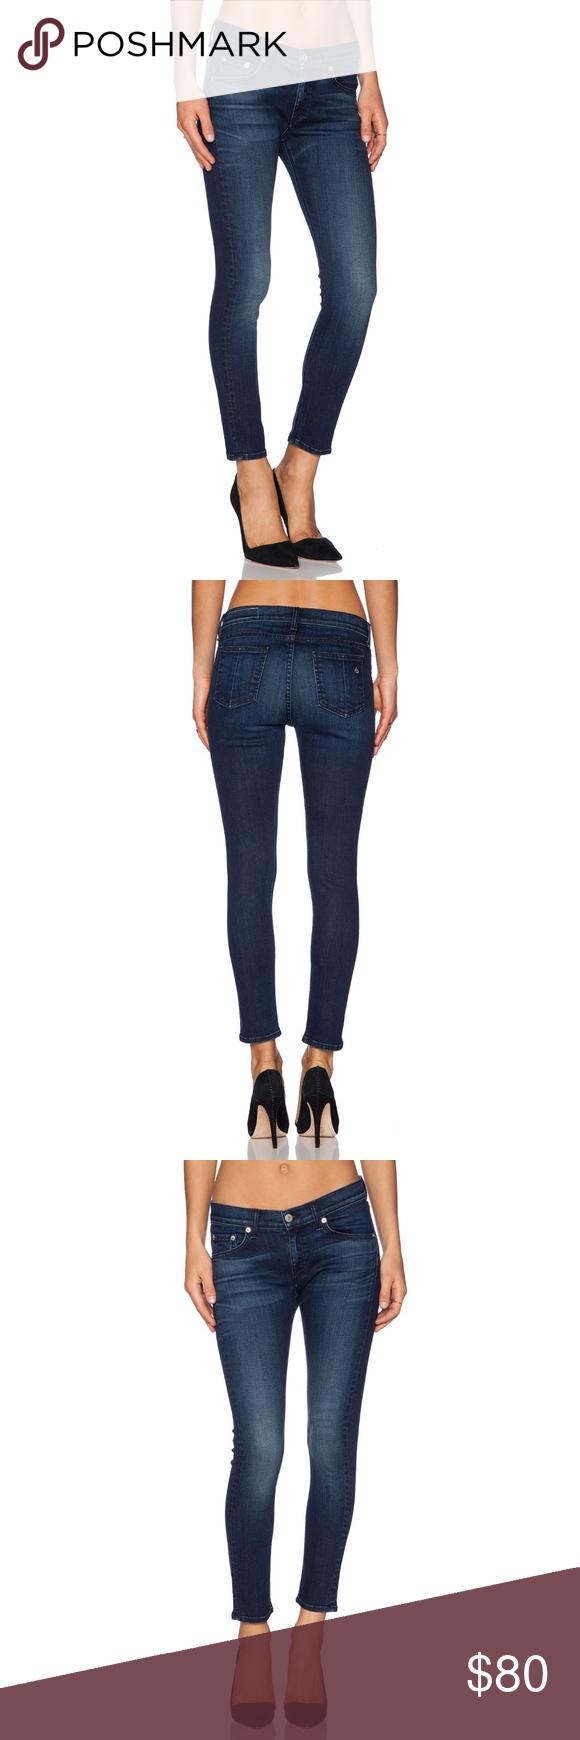 effab55ba rag & bone The Capri Jean Southport Dark Wash Slimming skinny style jeans  with stretch COLOR Southport dark wash 98% cotton , 2% polyurethane 13